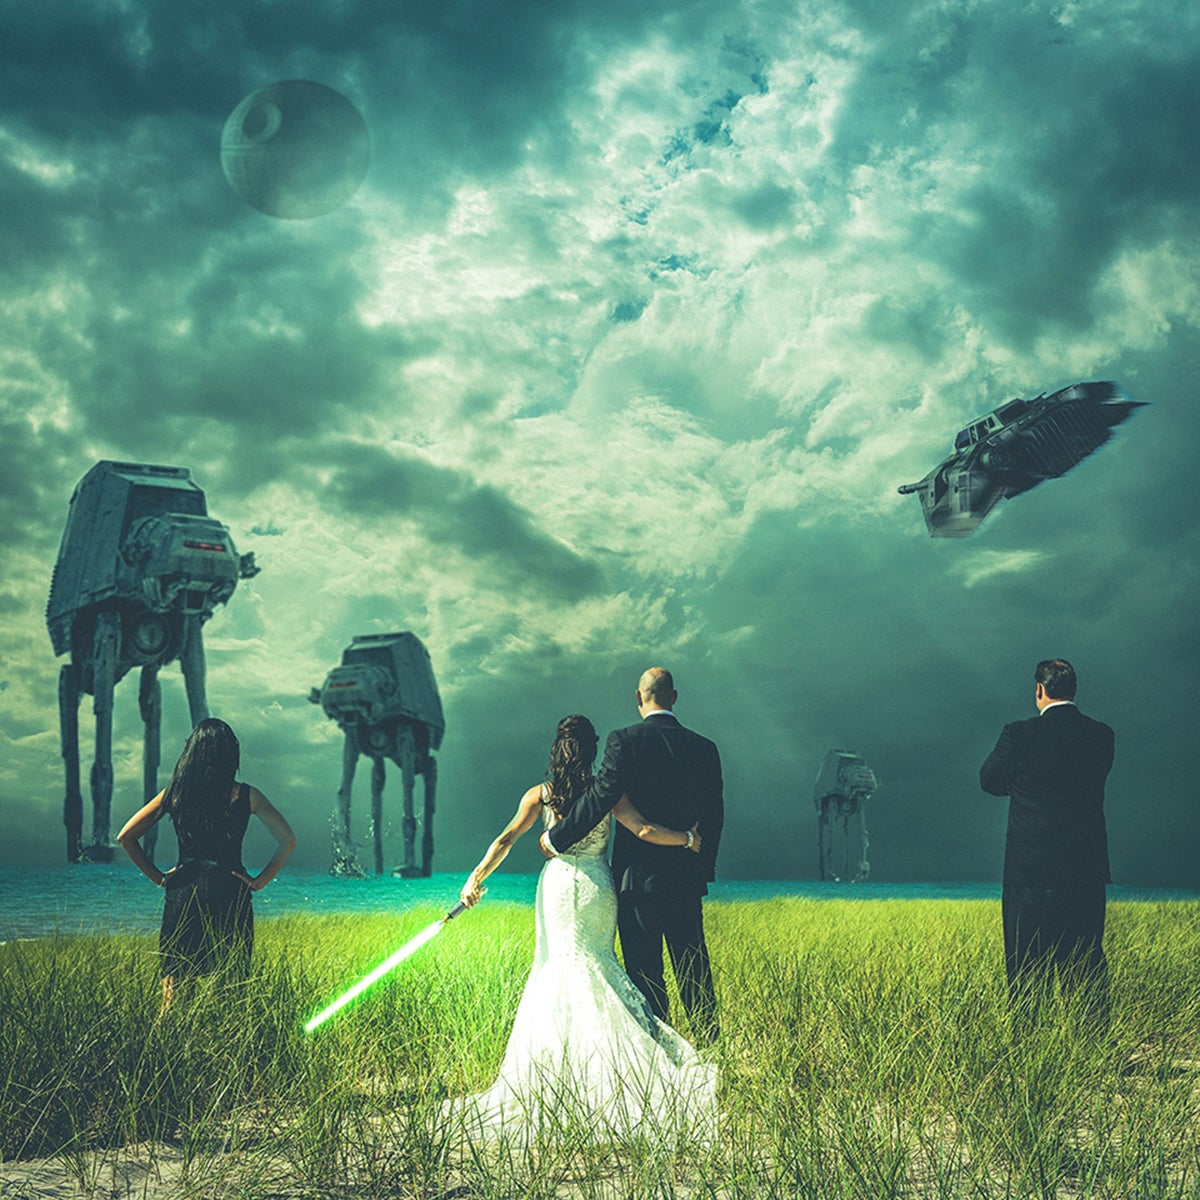 I Don't Always Shoot Weddings, But When I Do…